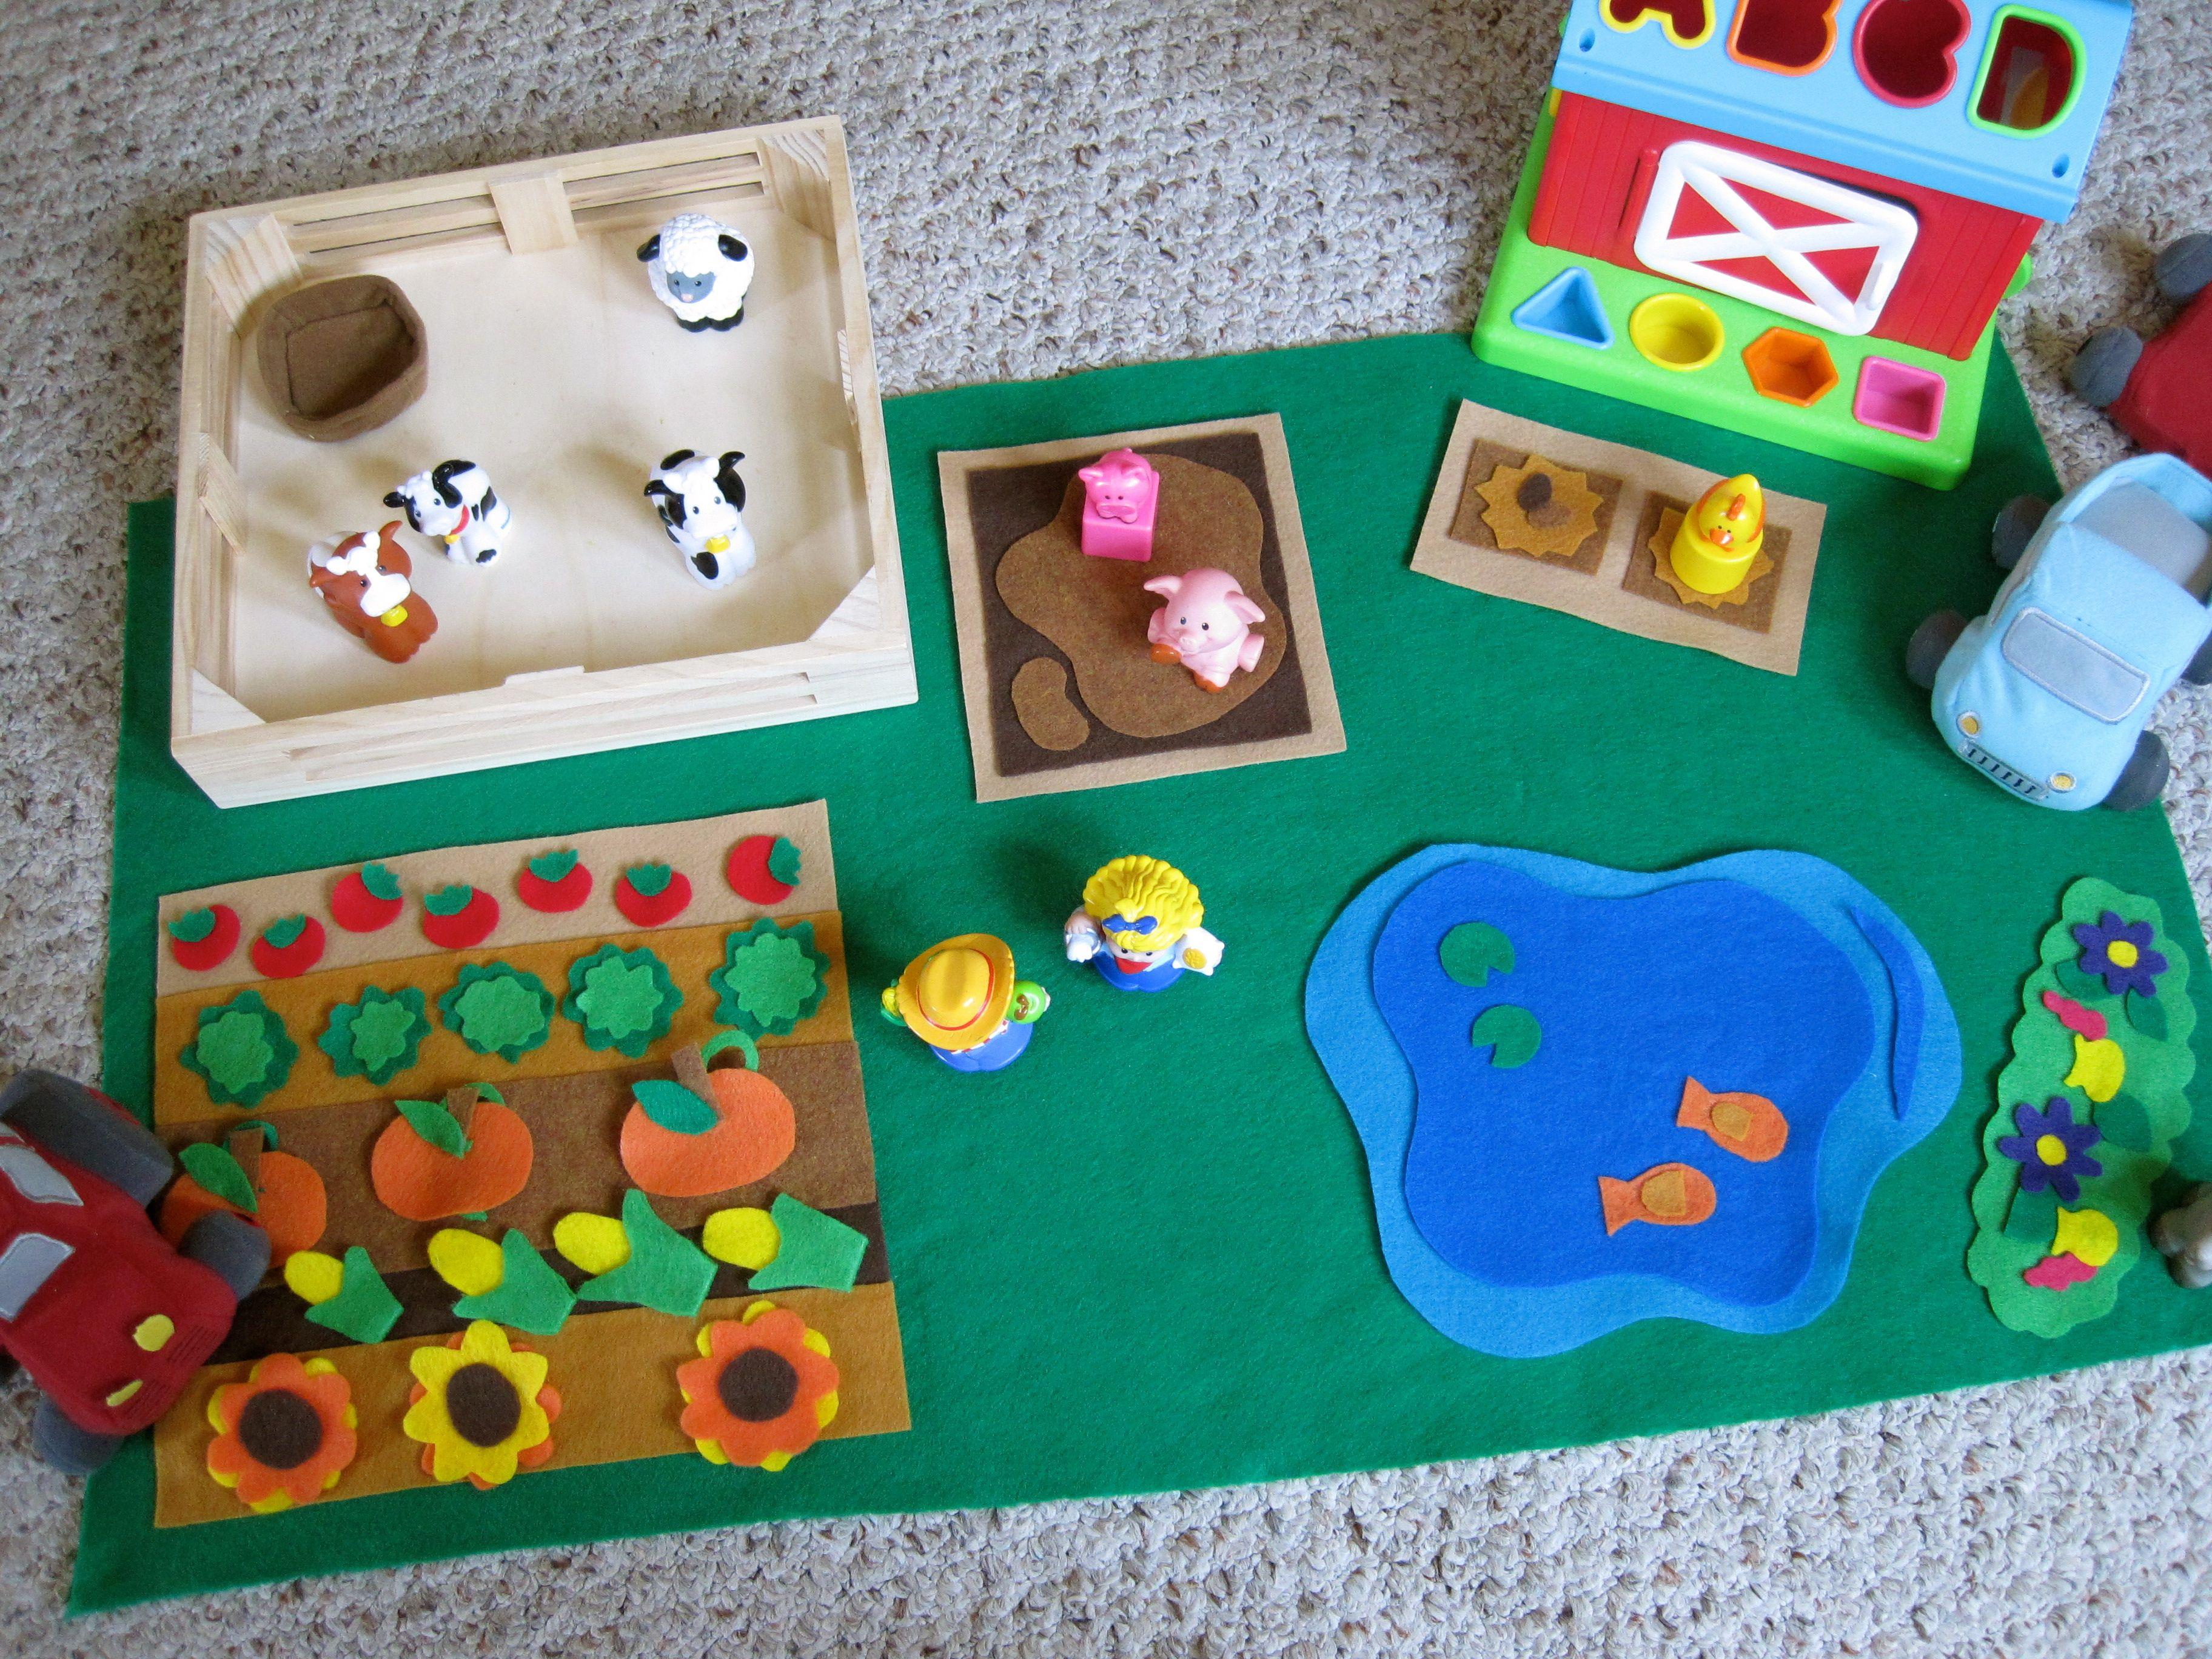 play felt to board games